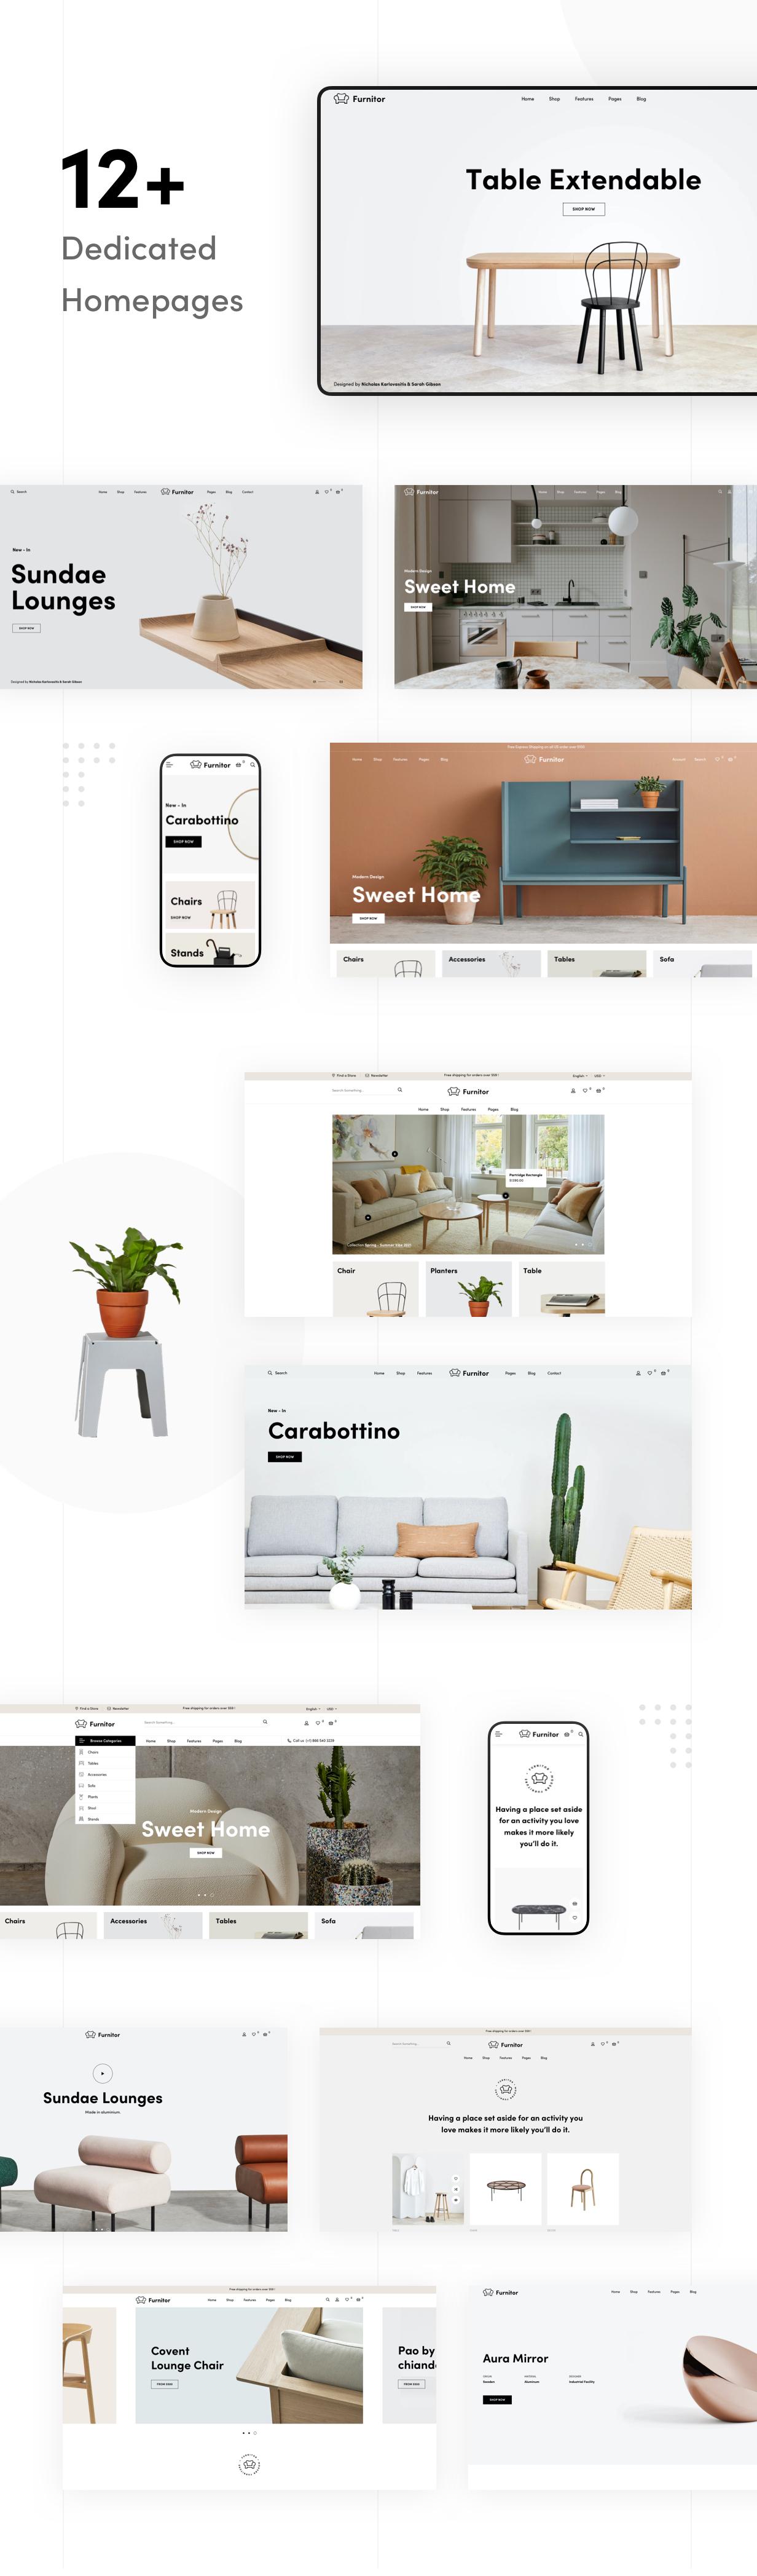 Furnitor – Minimalism Furniture Store WordPress Theme - 10